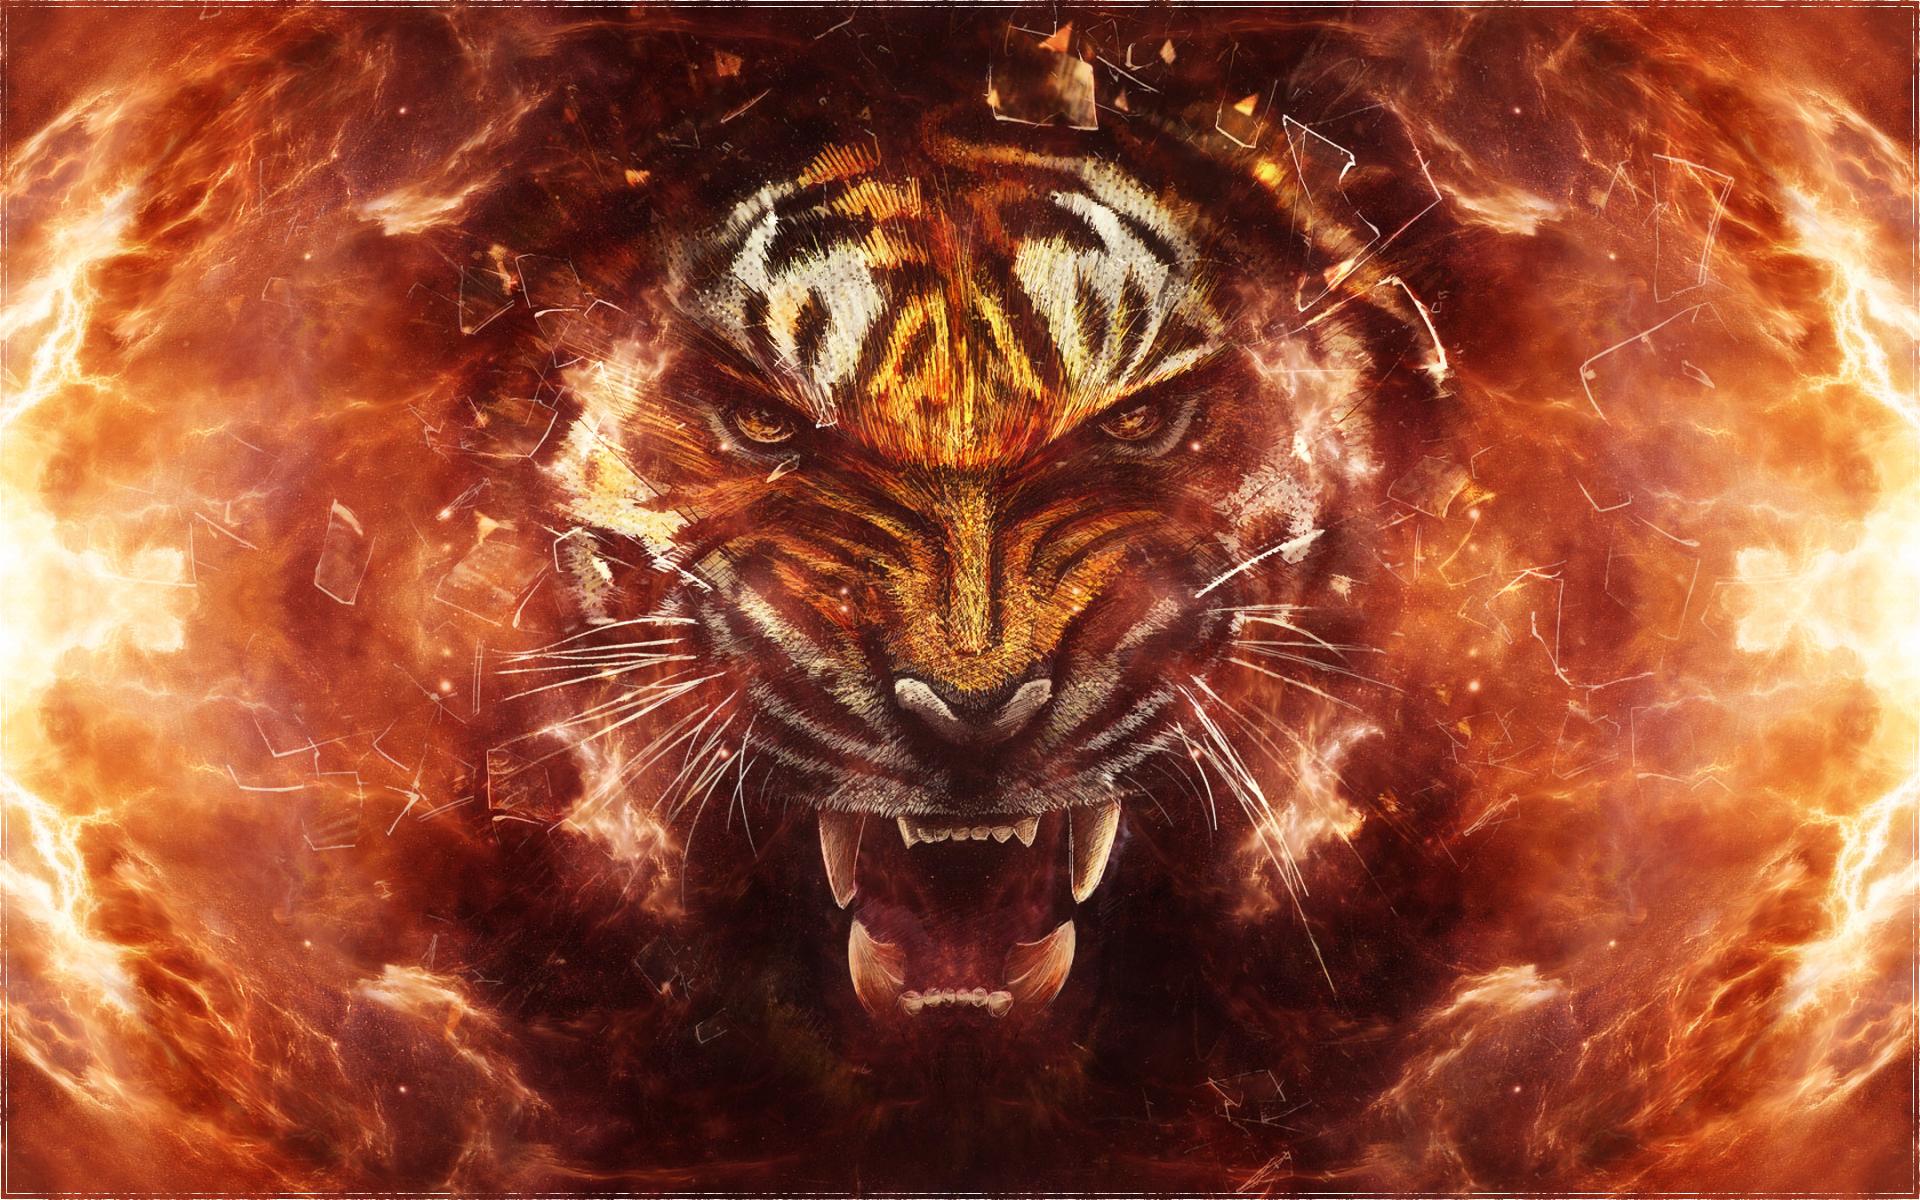 Tiger blast